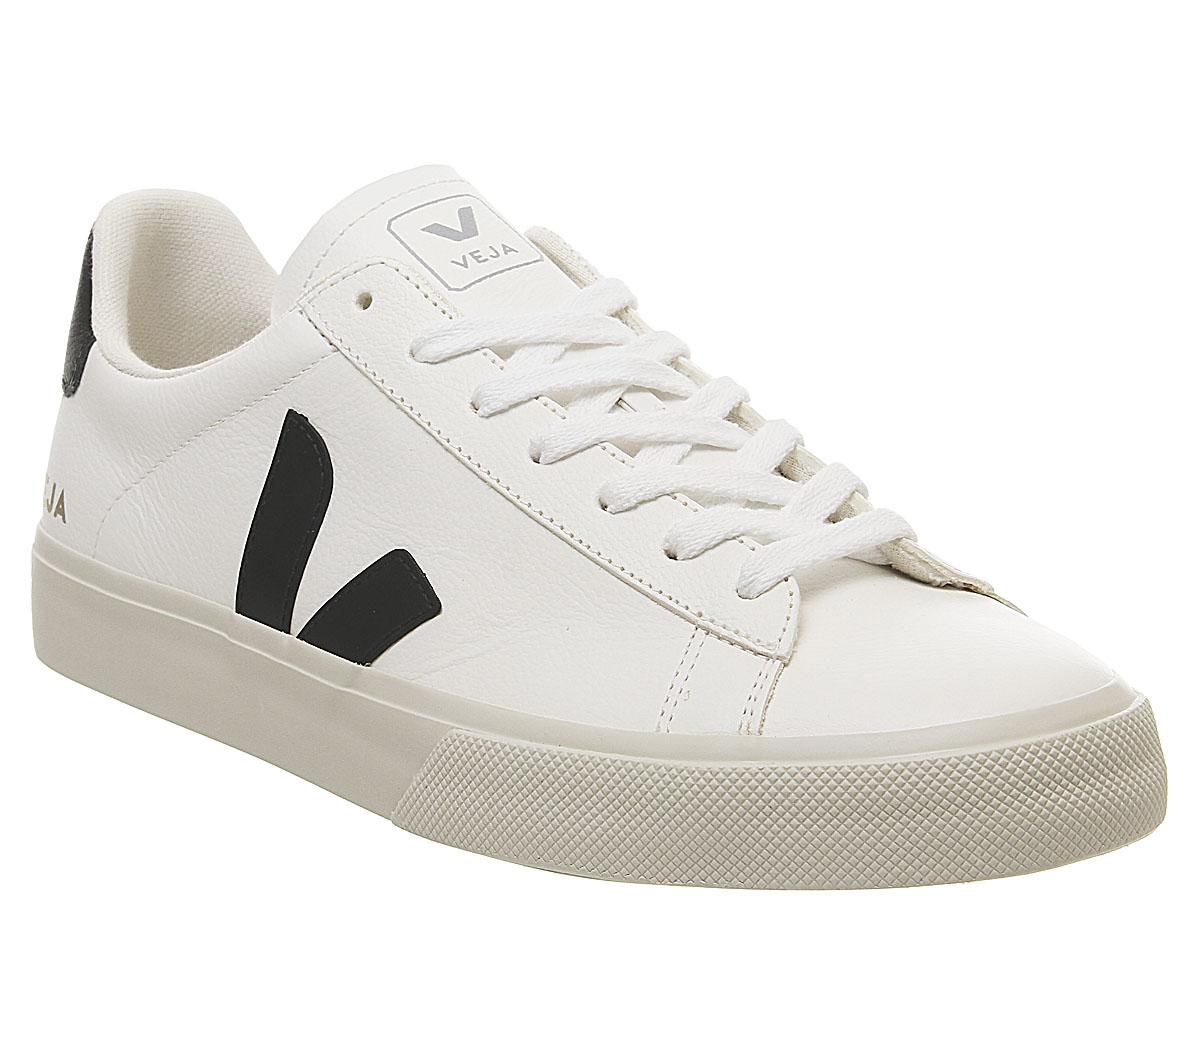 Veja Campo White Black Leather - Unisex